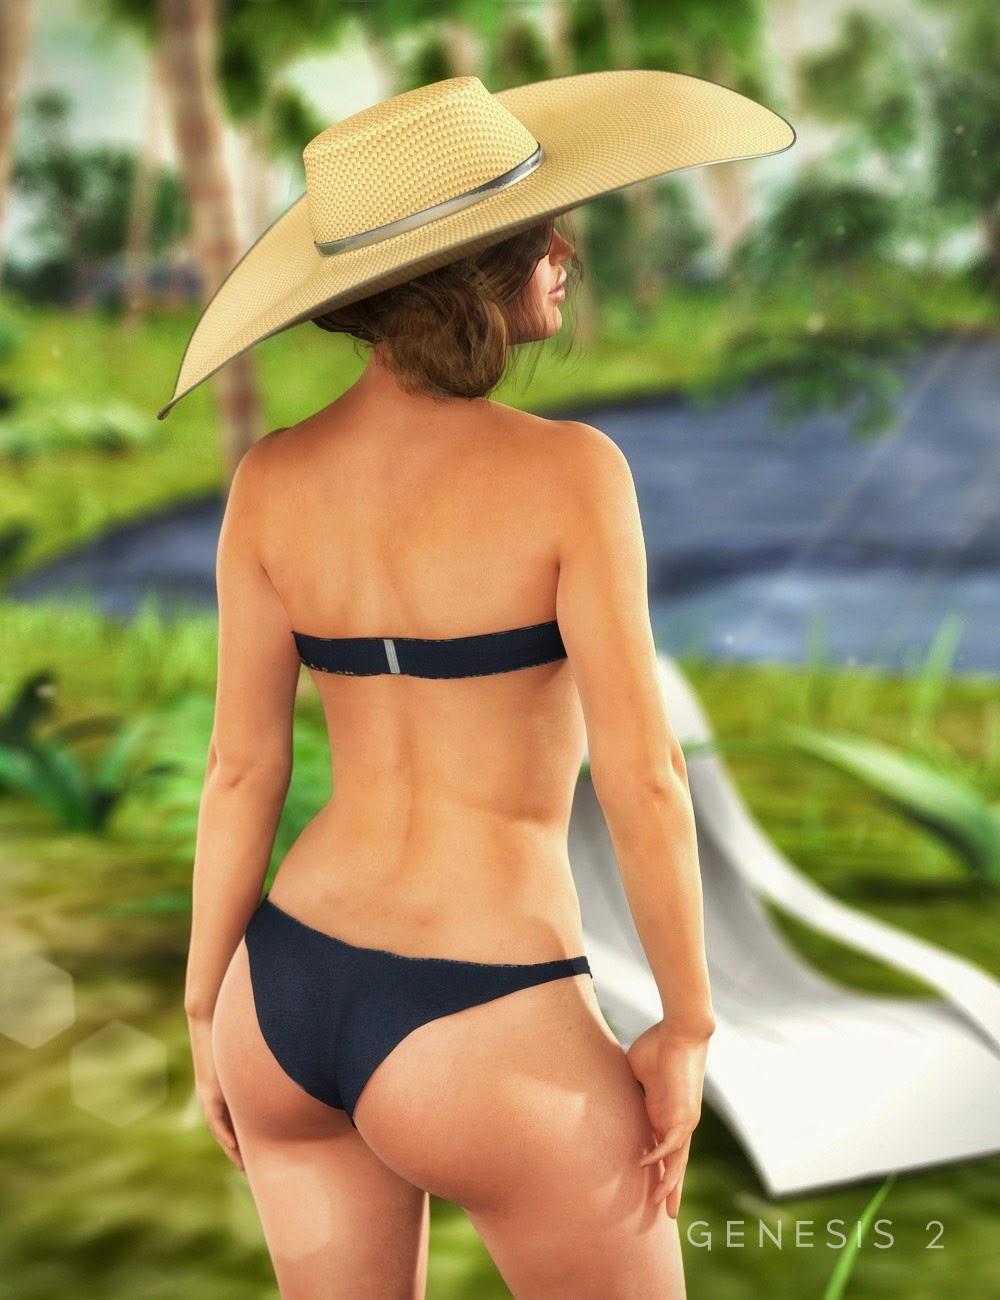 RW mer Bikini pour Genesis 2 Femme